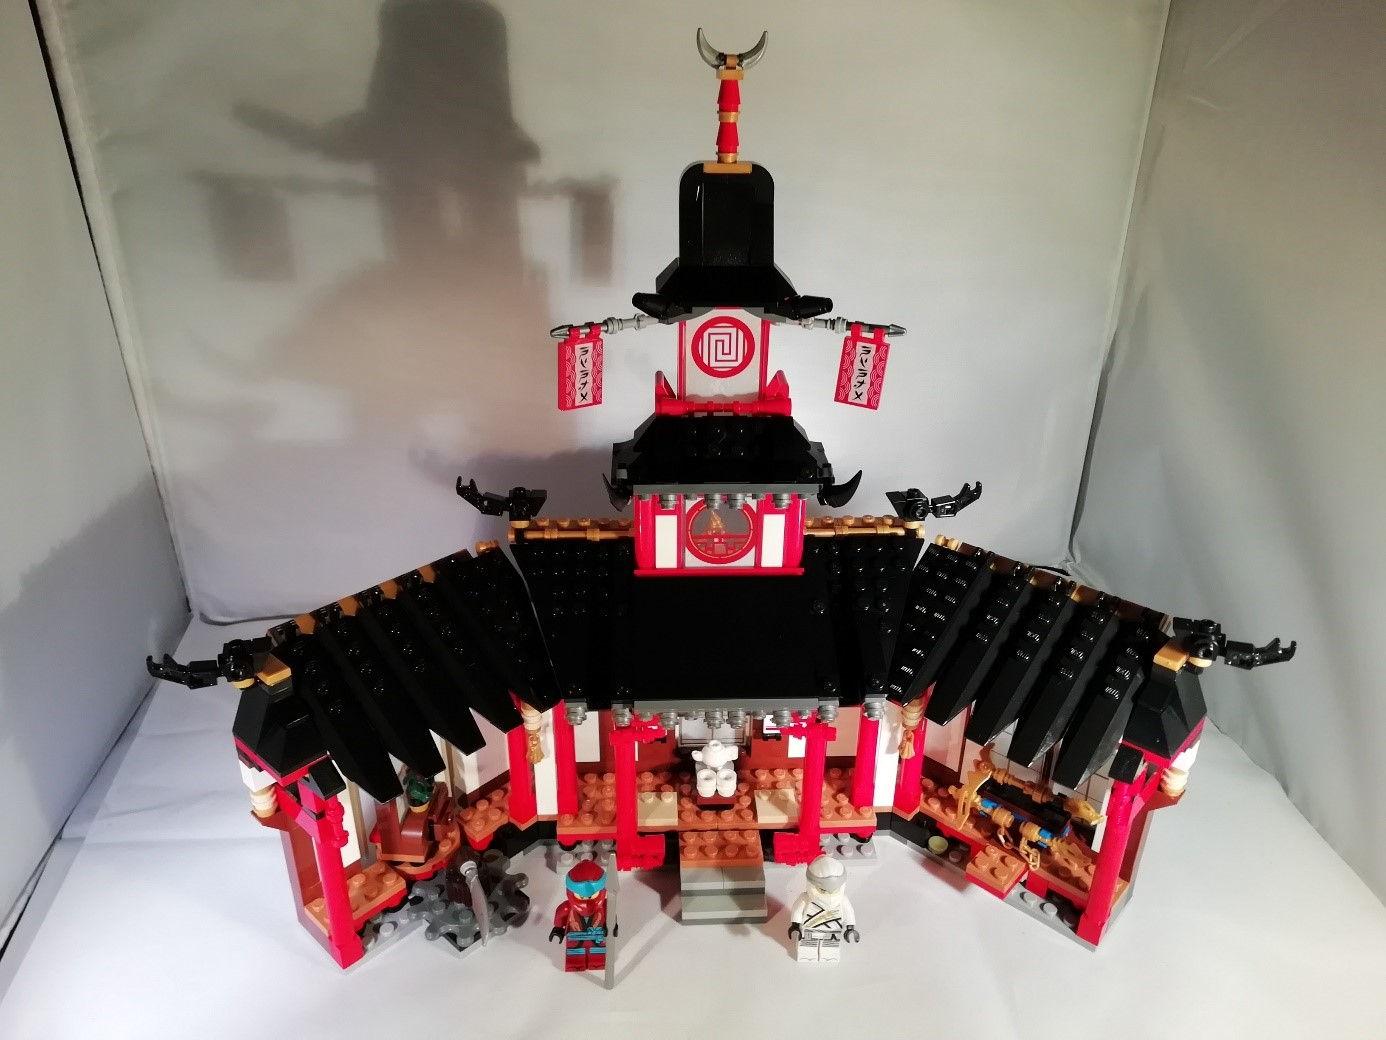 Kloster mit Ninjaornamente